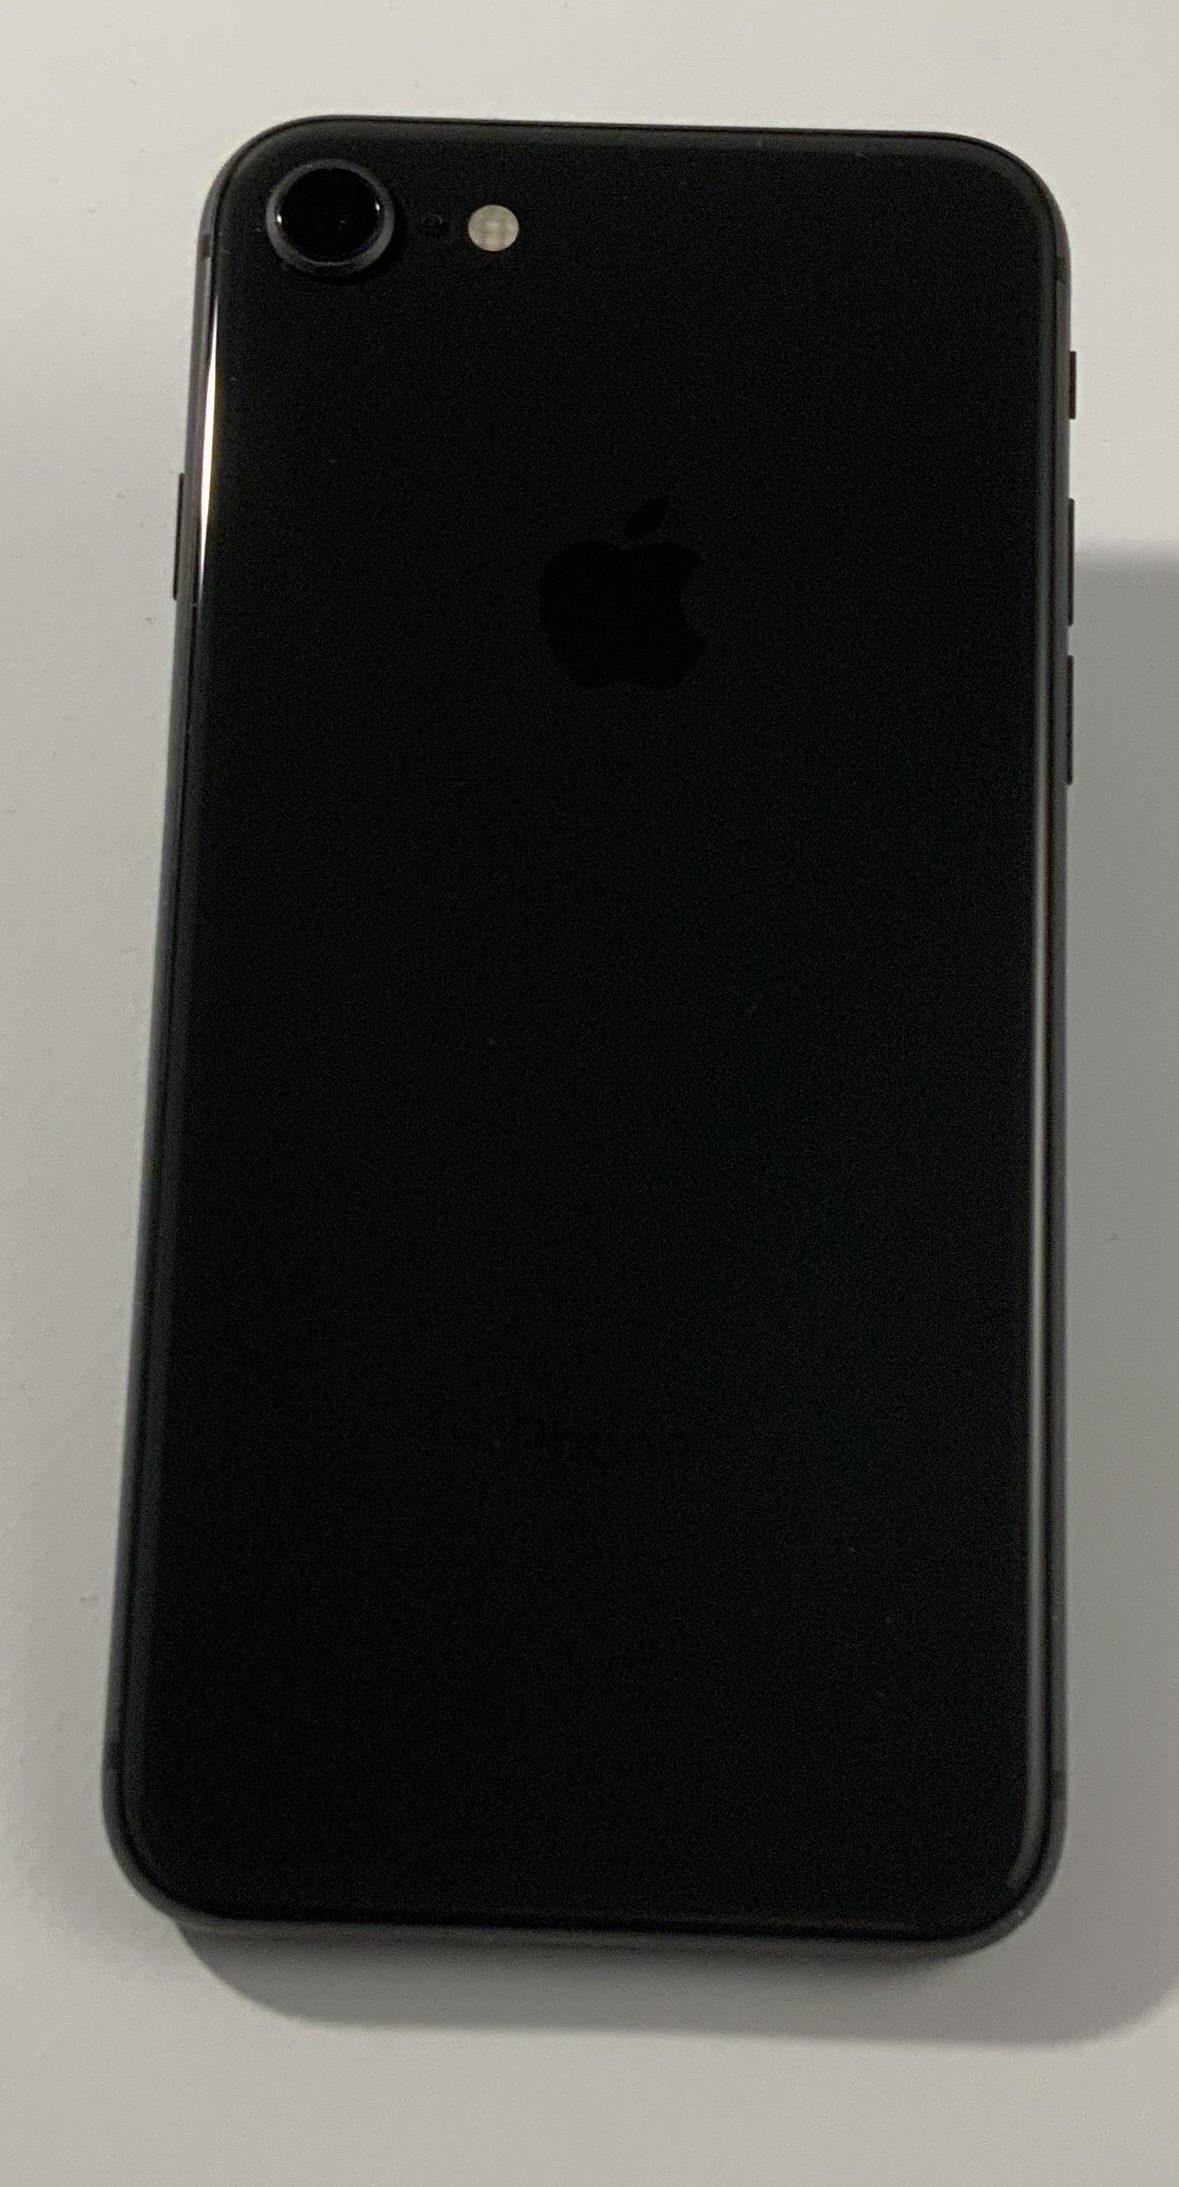 iPhone 8 256GB, 256GB, Space Gray, obraz 2